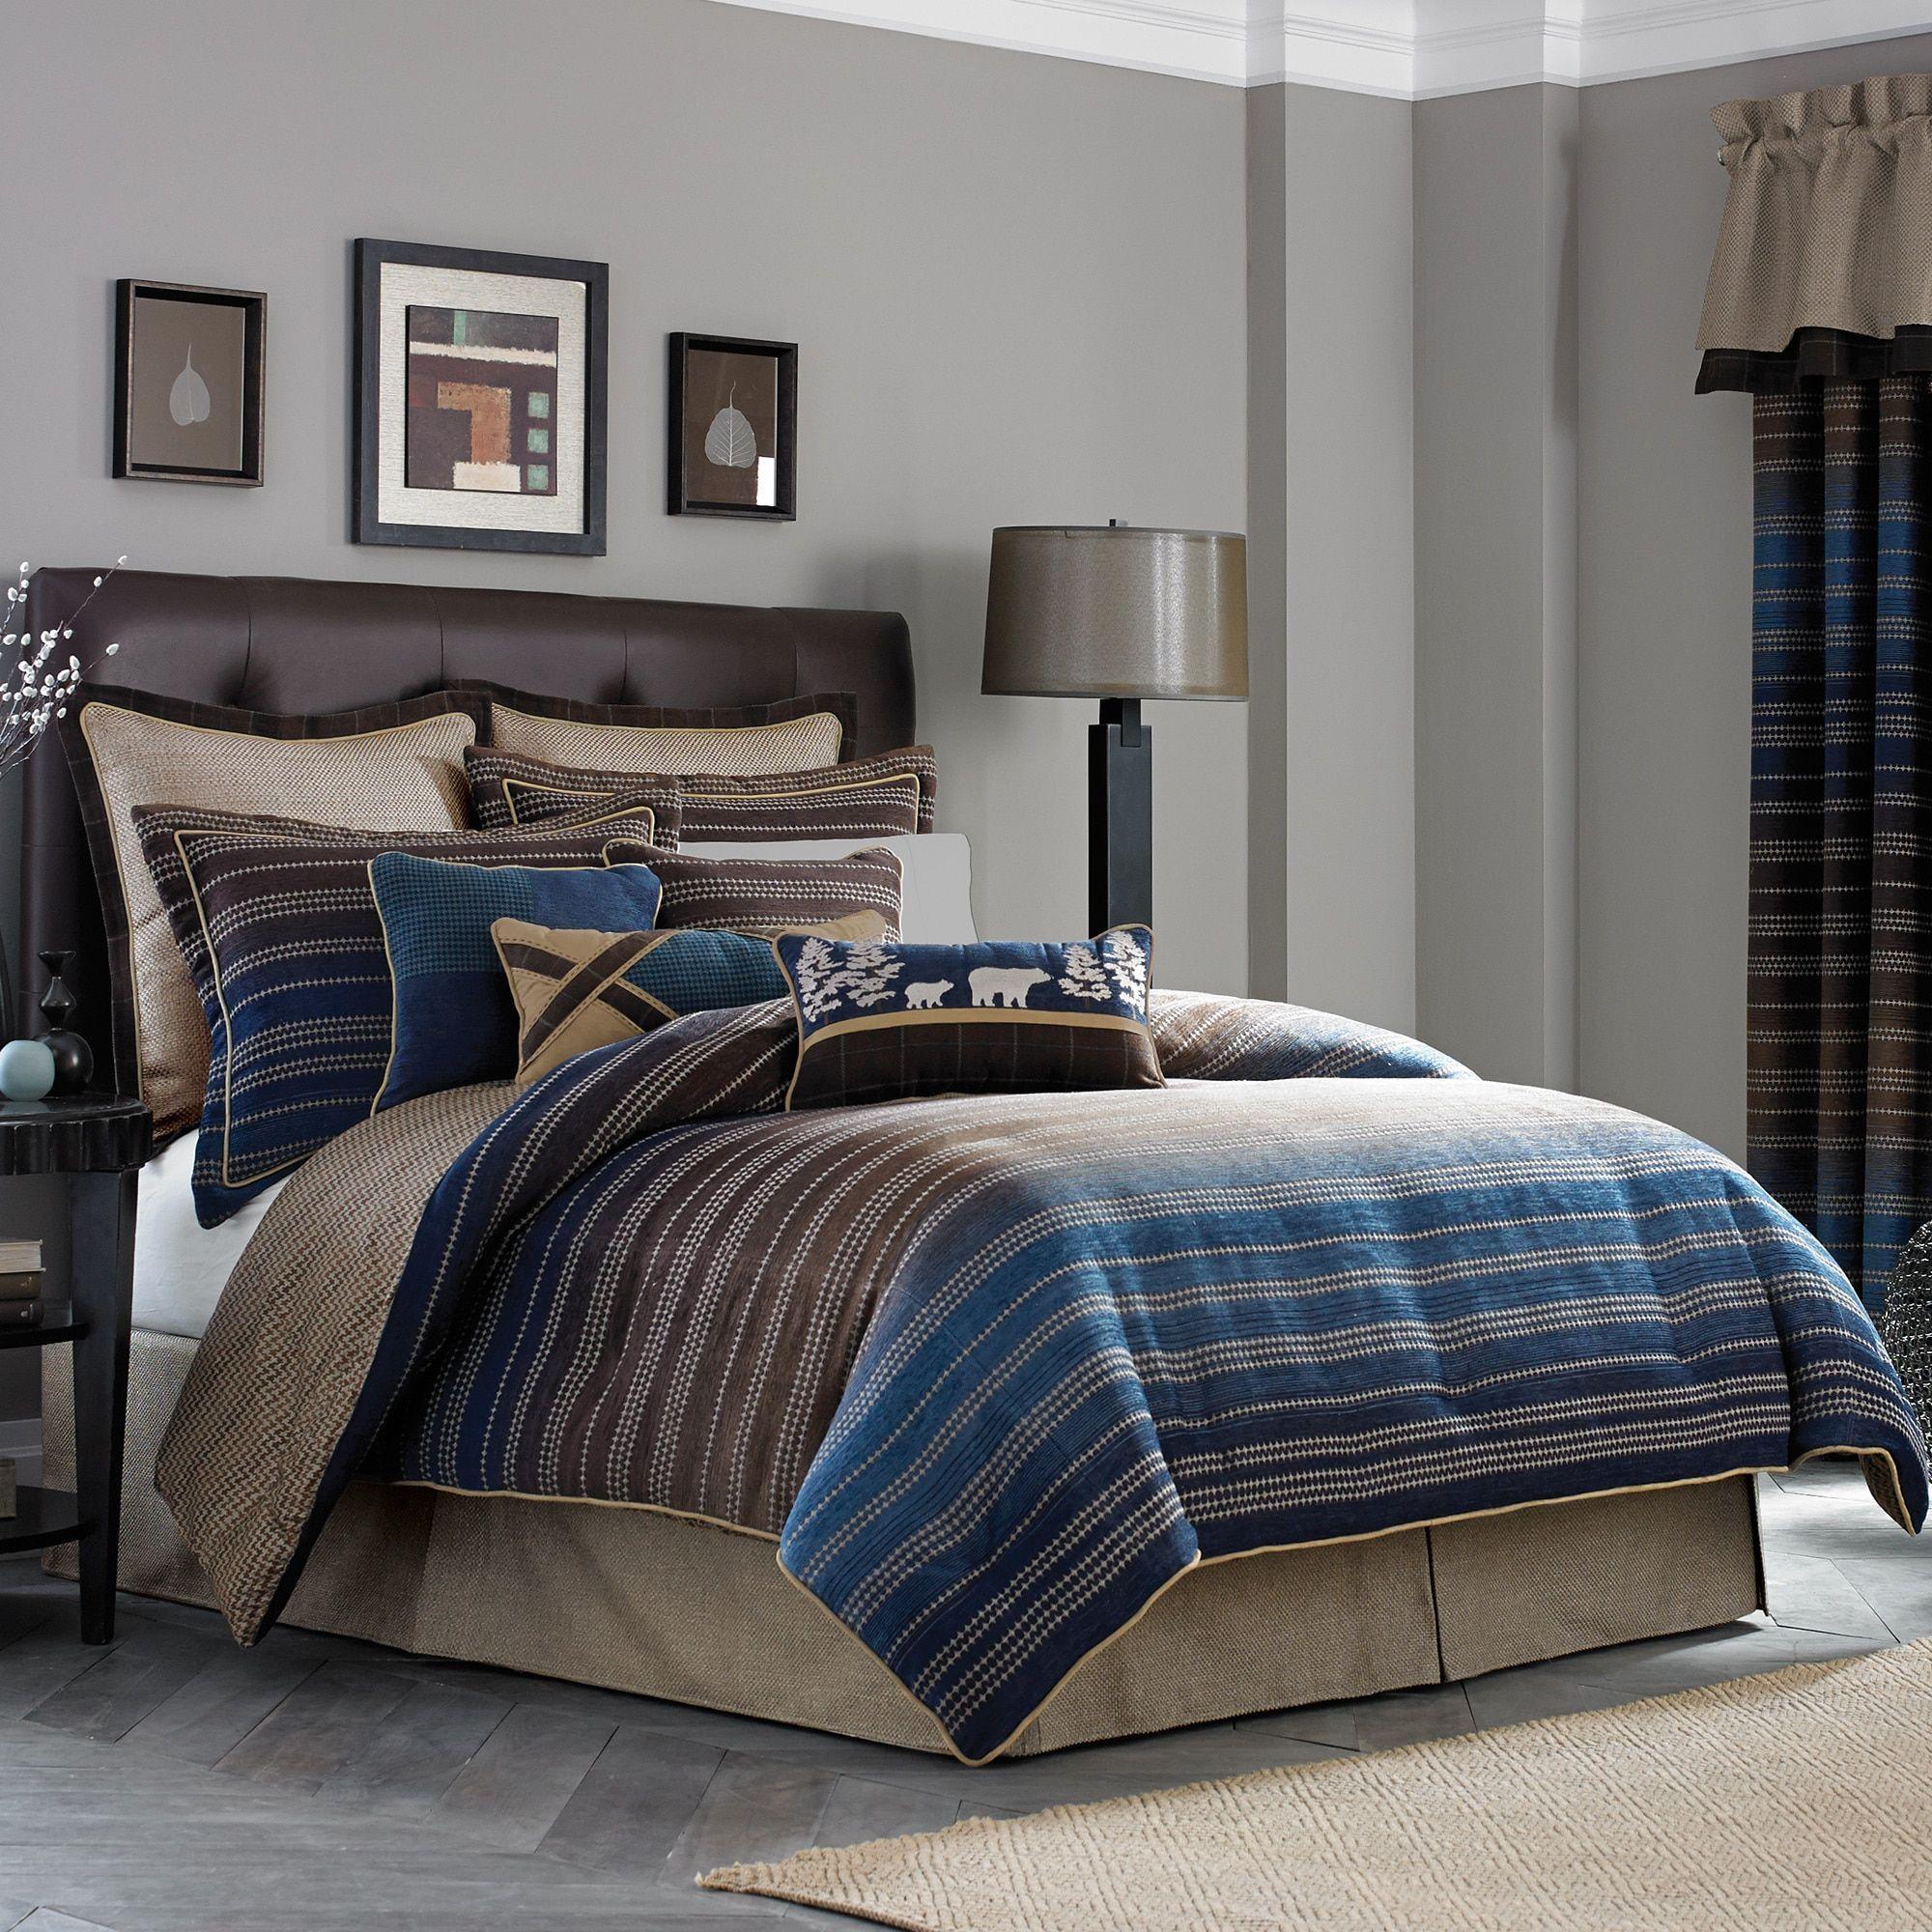 and comforter men uncategorized best the nordstrom for f inspiration sets size ideas image of bedding full